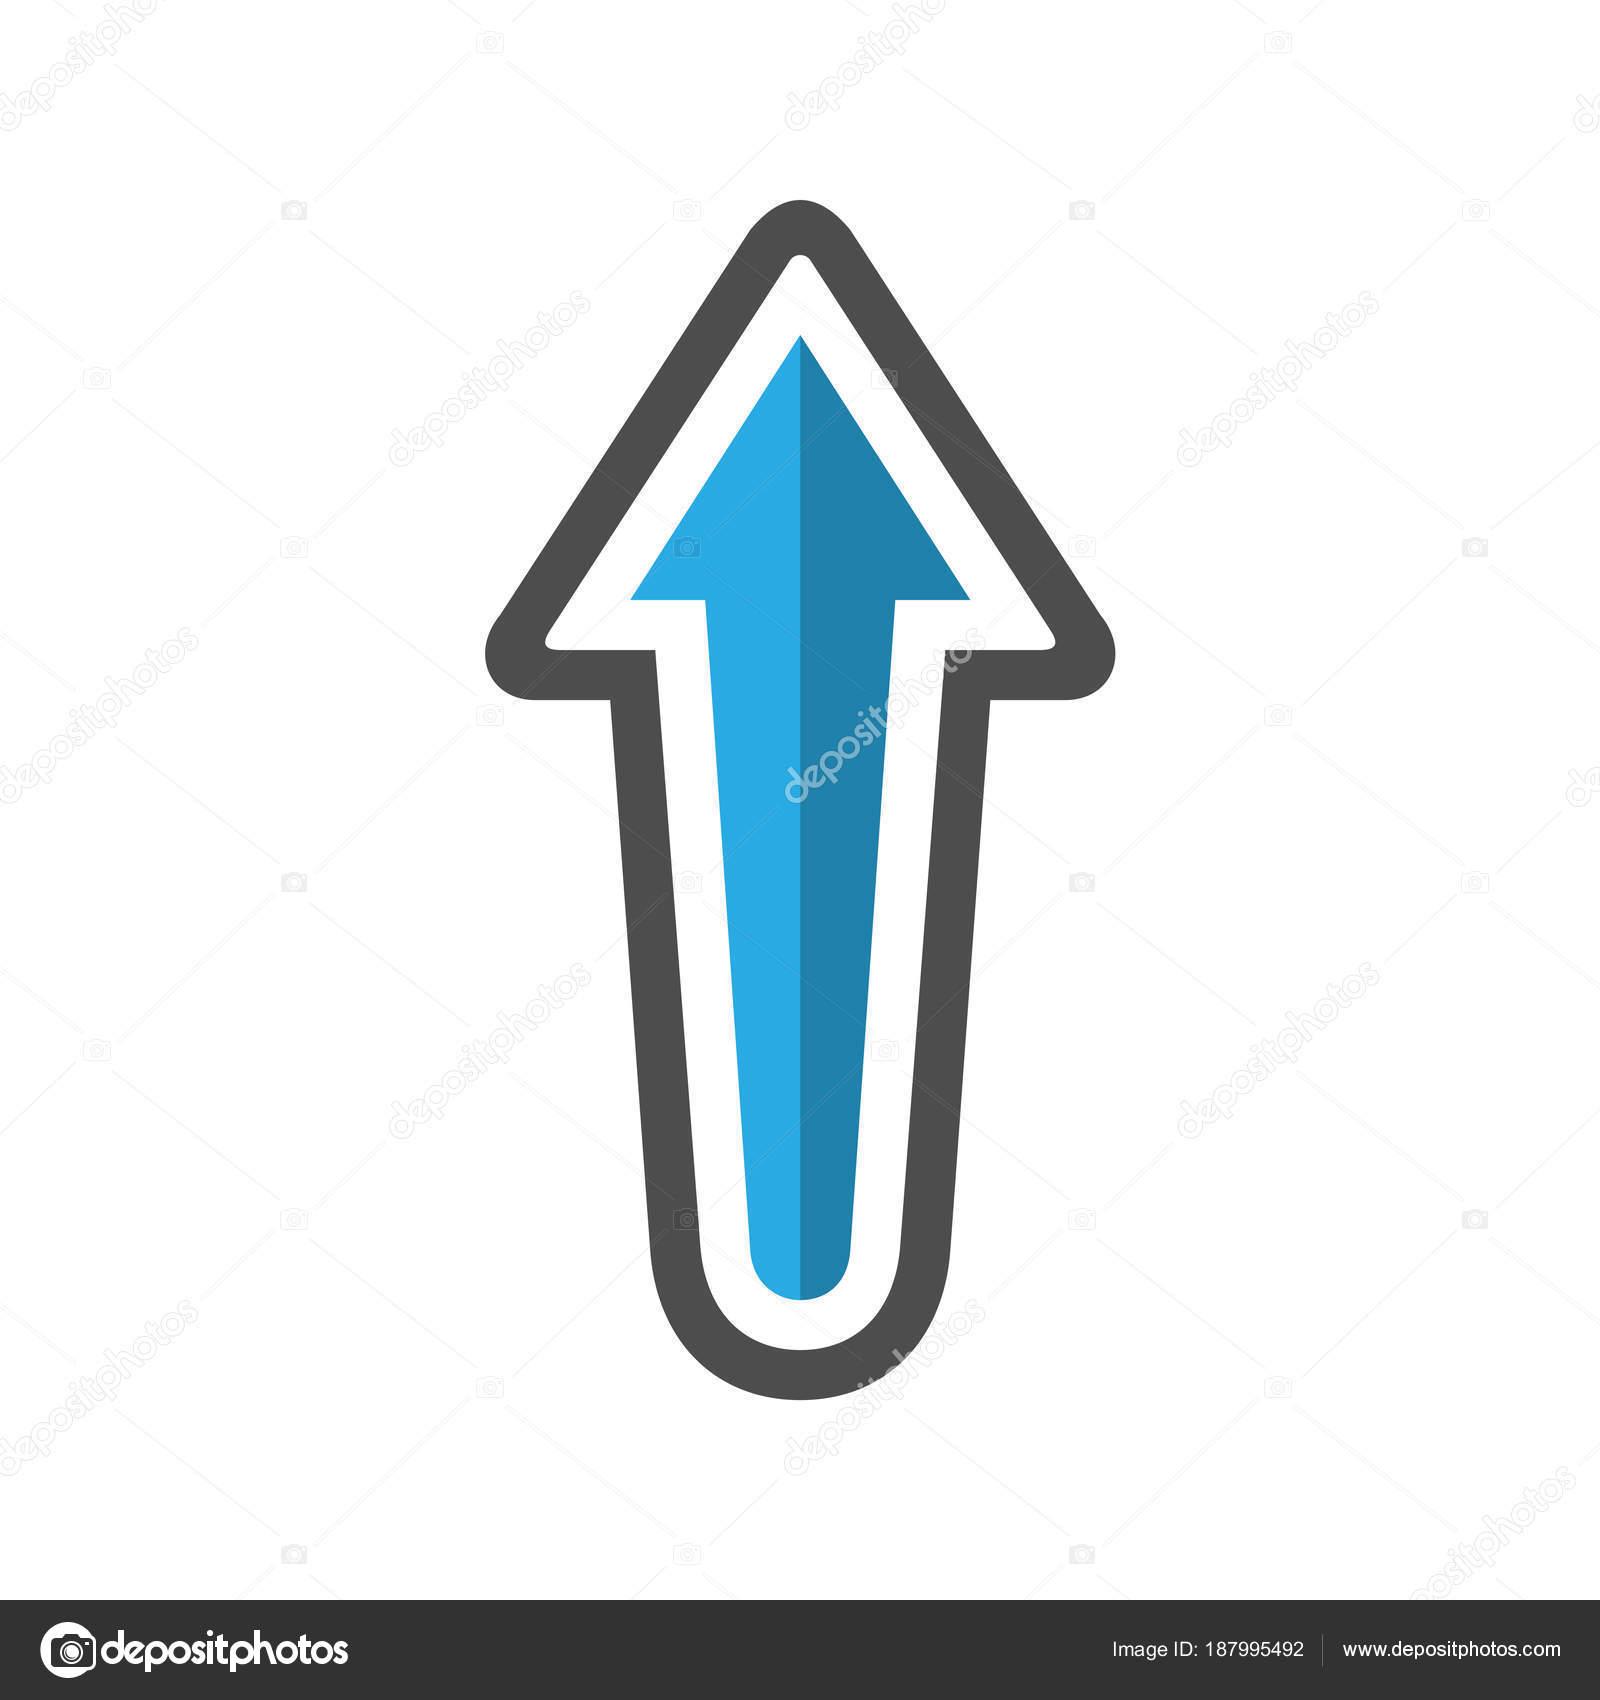 up arrow not working